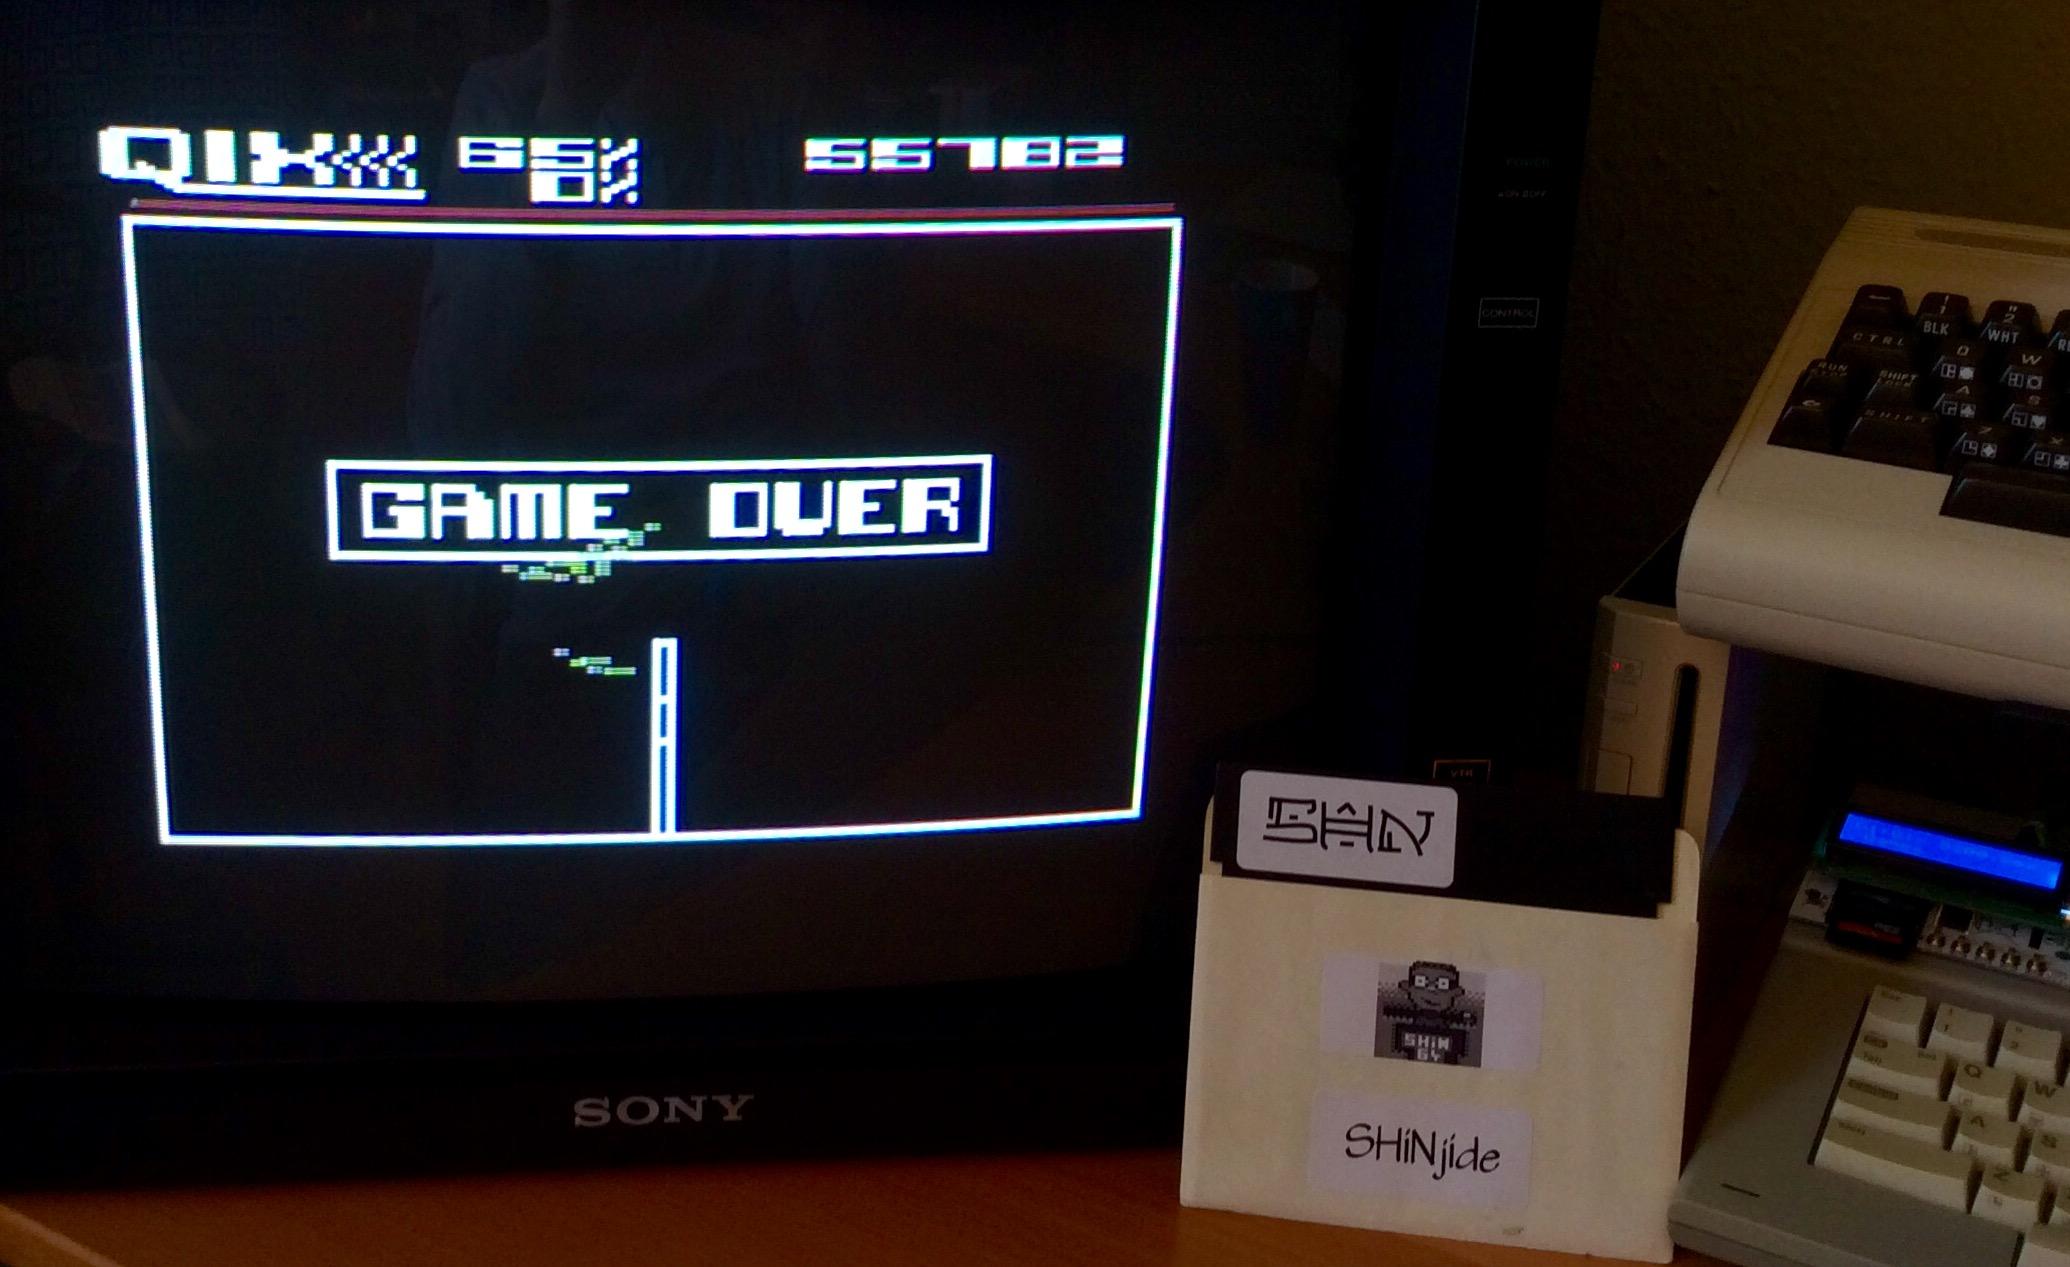 SHiNjide: Qix 5200 [Novice] (Atari 400/800/XL/XE) 55,782 points on 2015-03-06 09:01:35